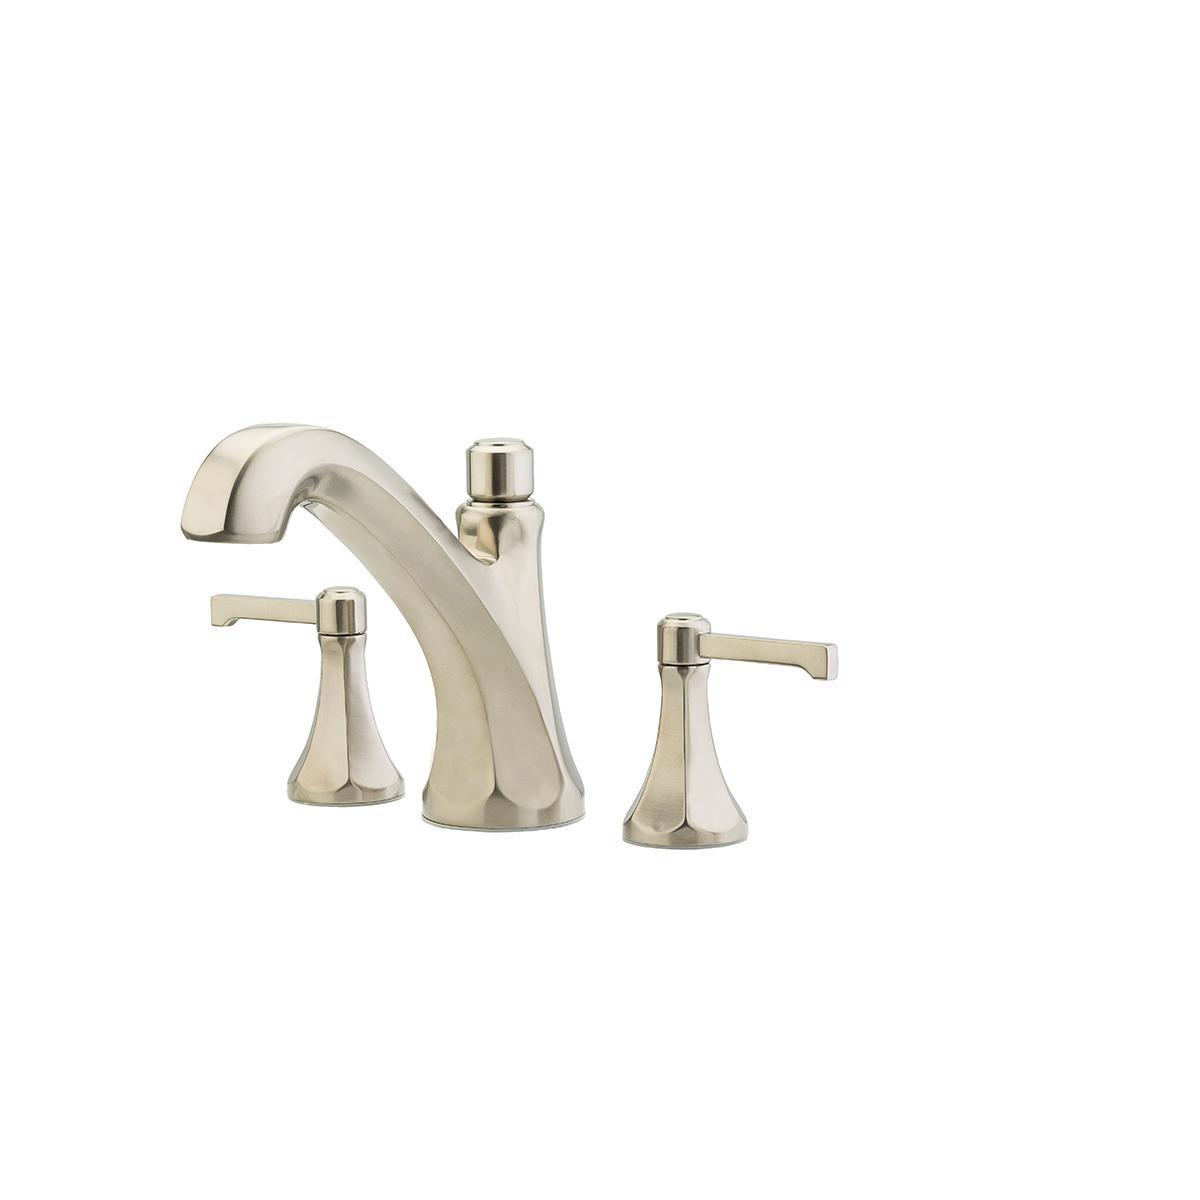 Bath4All - Pfister RT65DEY Arterra Deck Mounted Roman Tub Faucet Trim